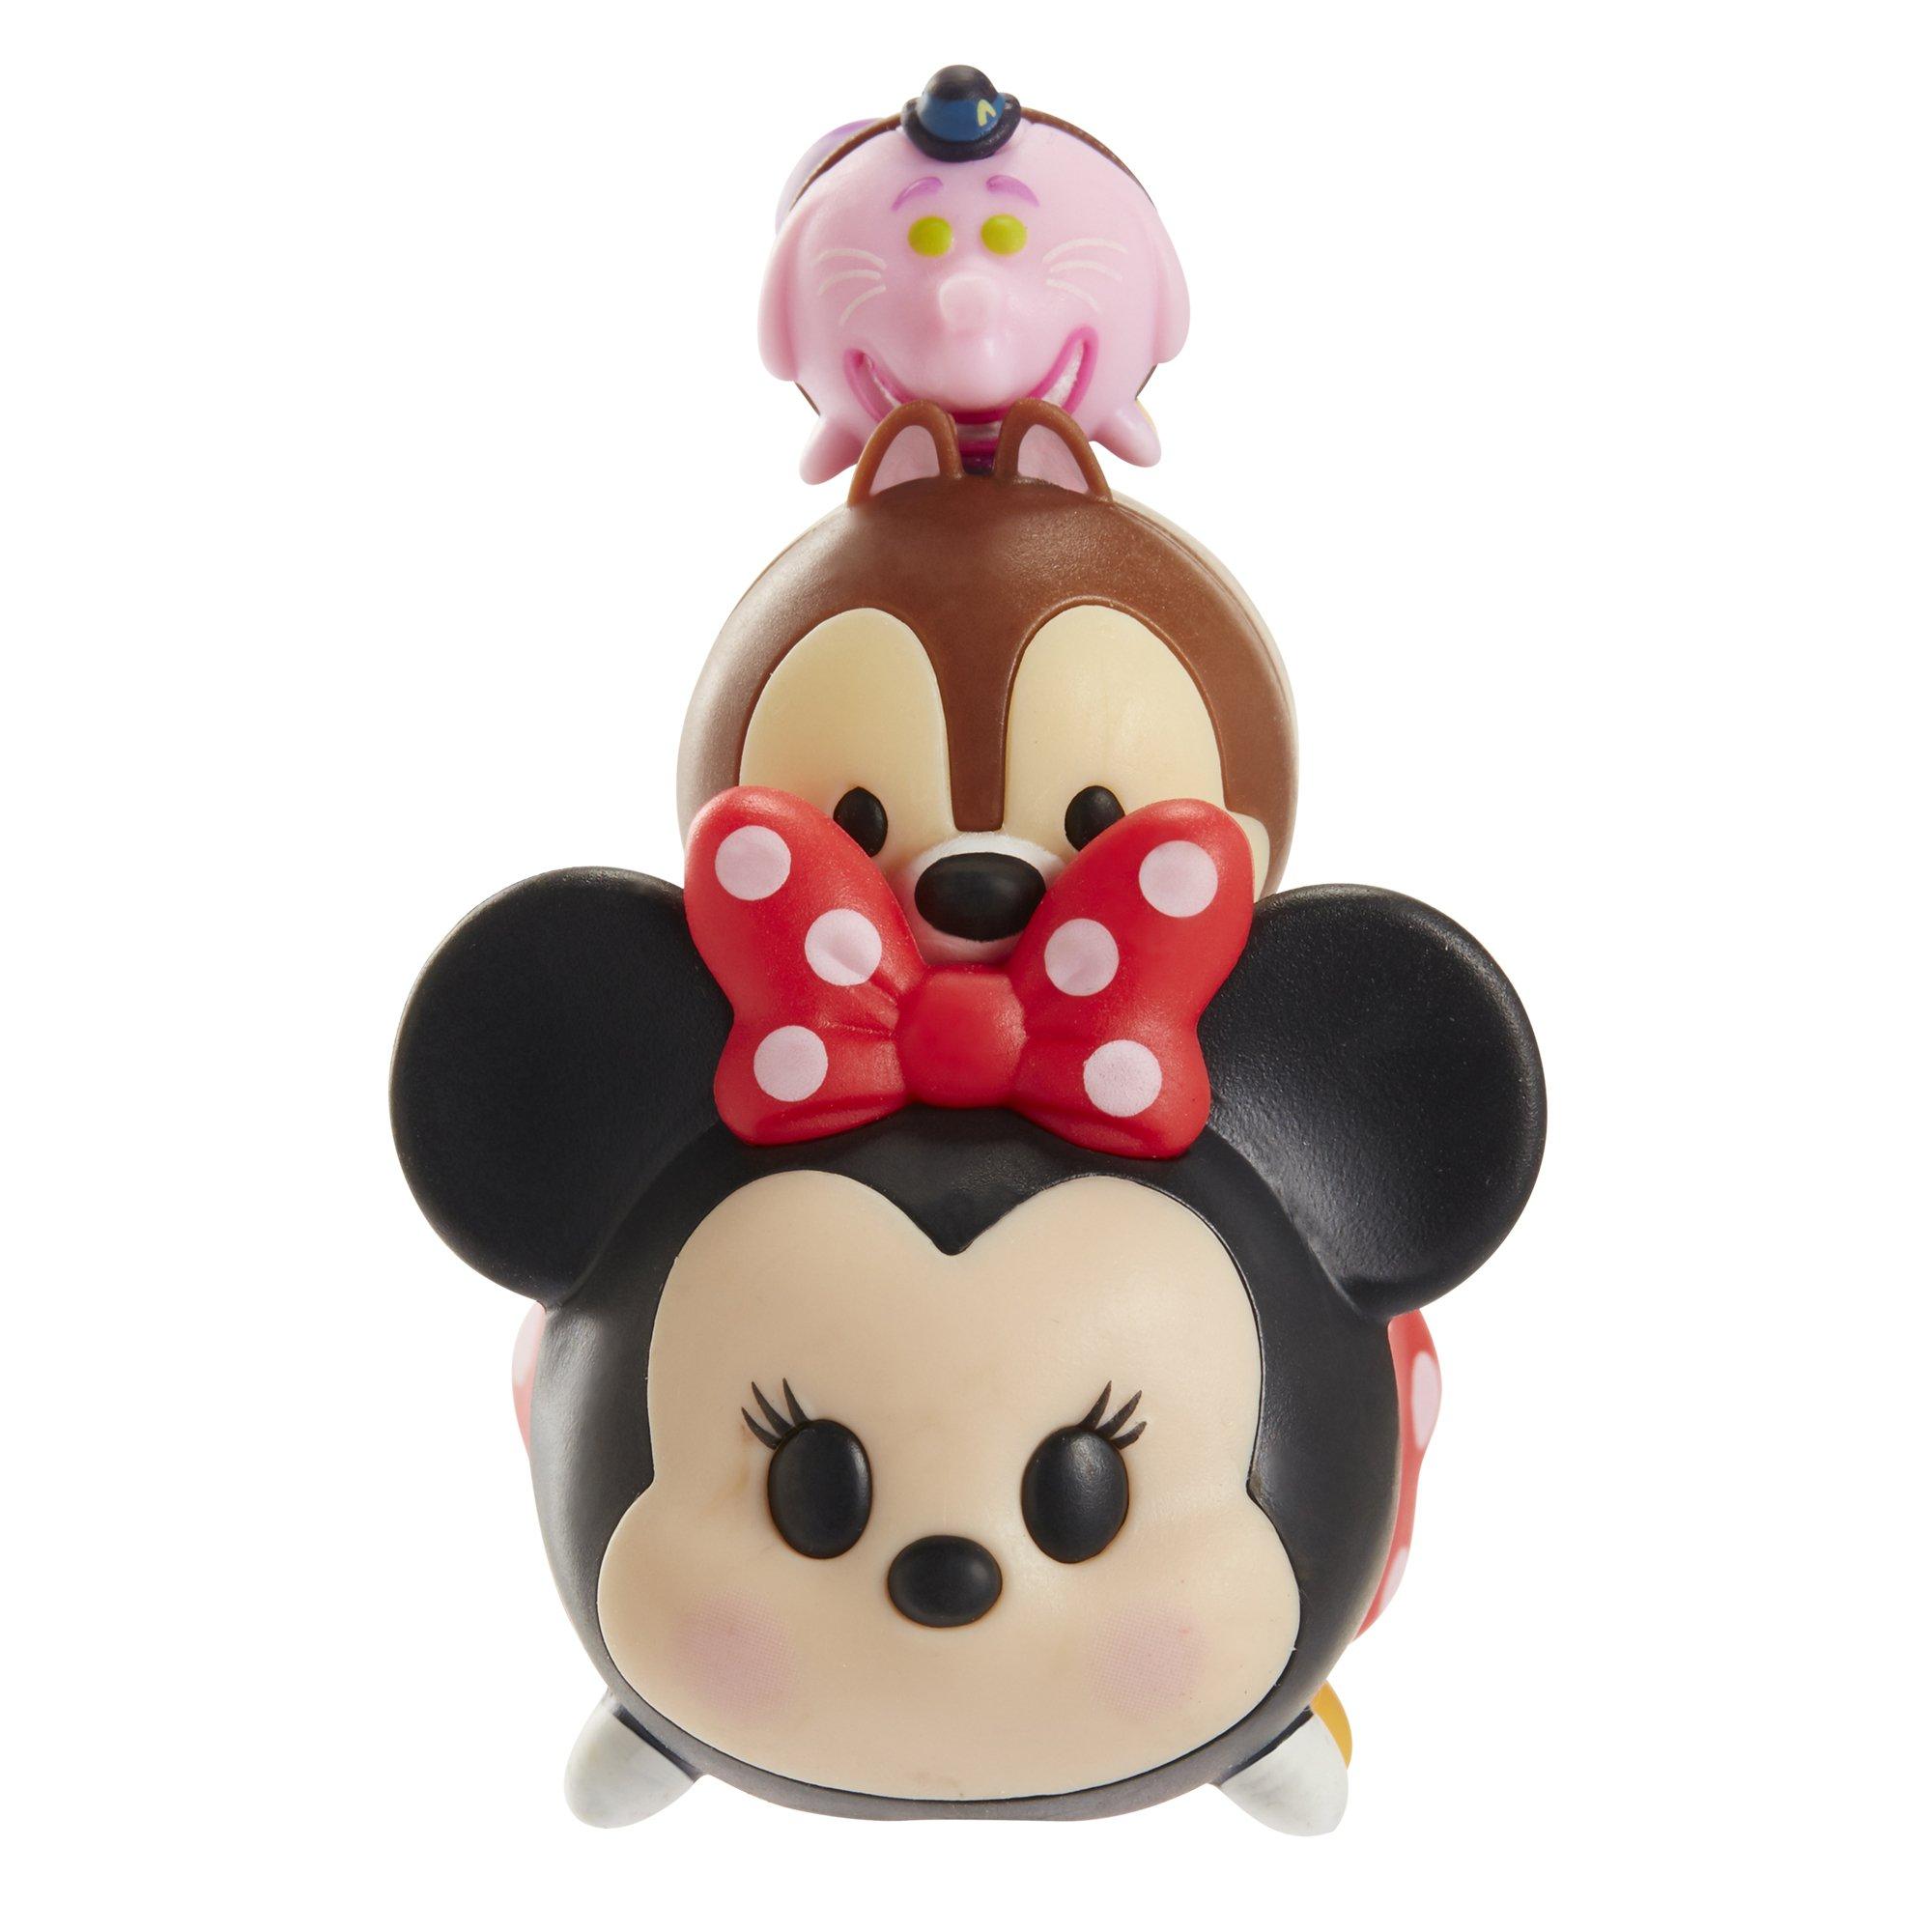 Tsum Tsum 3-Pack Figures: Minnie/Chip/Bing Bong by Tsum Tsum (Image #1)